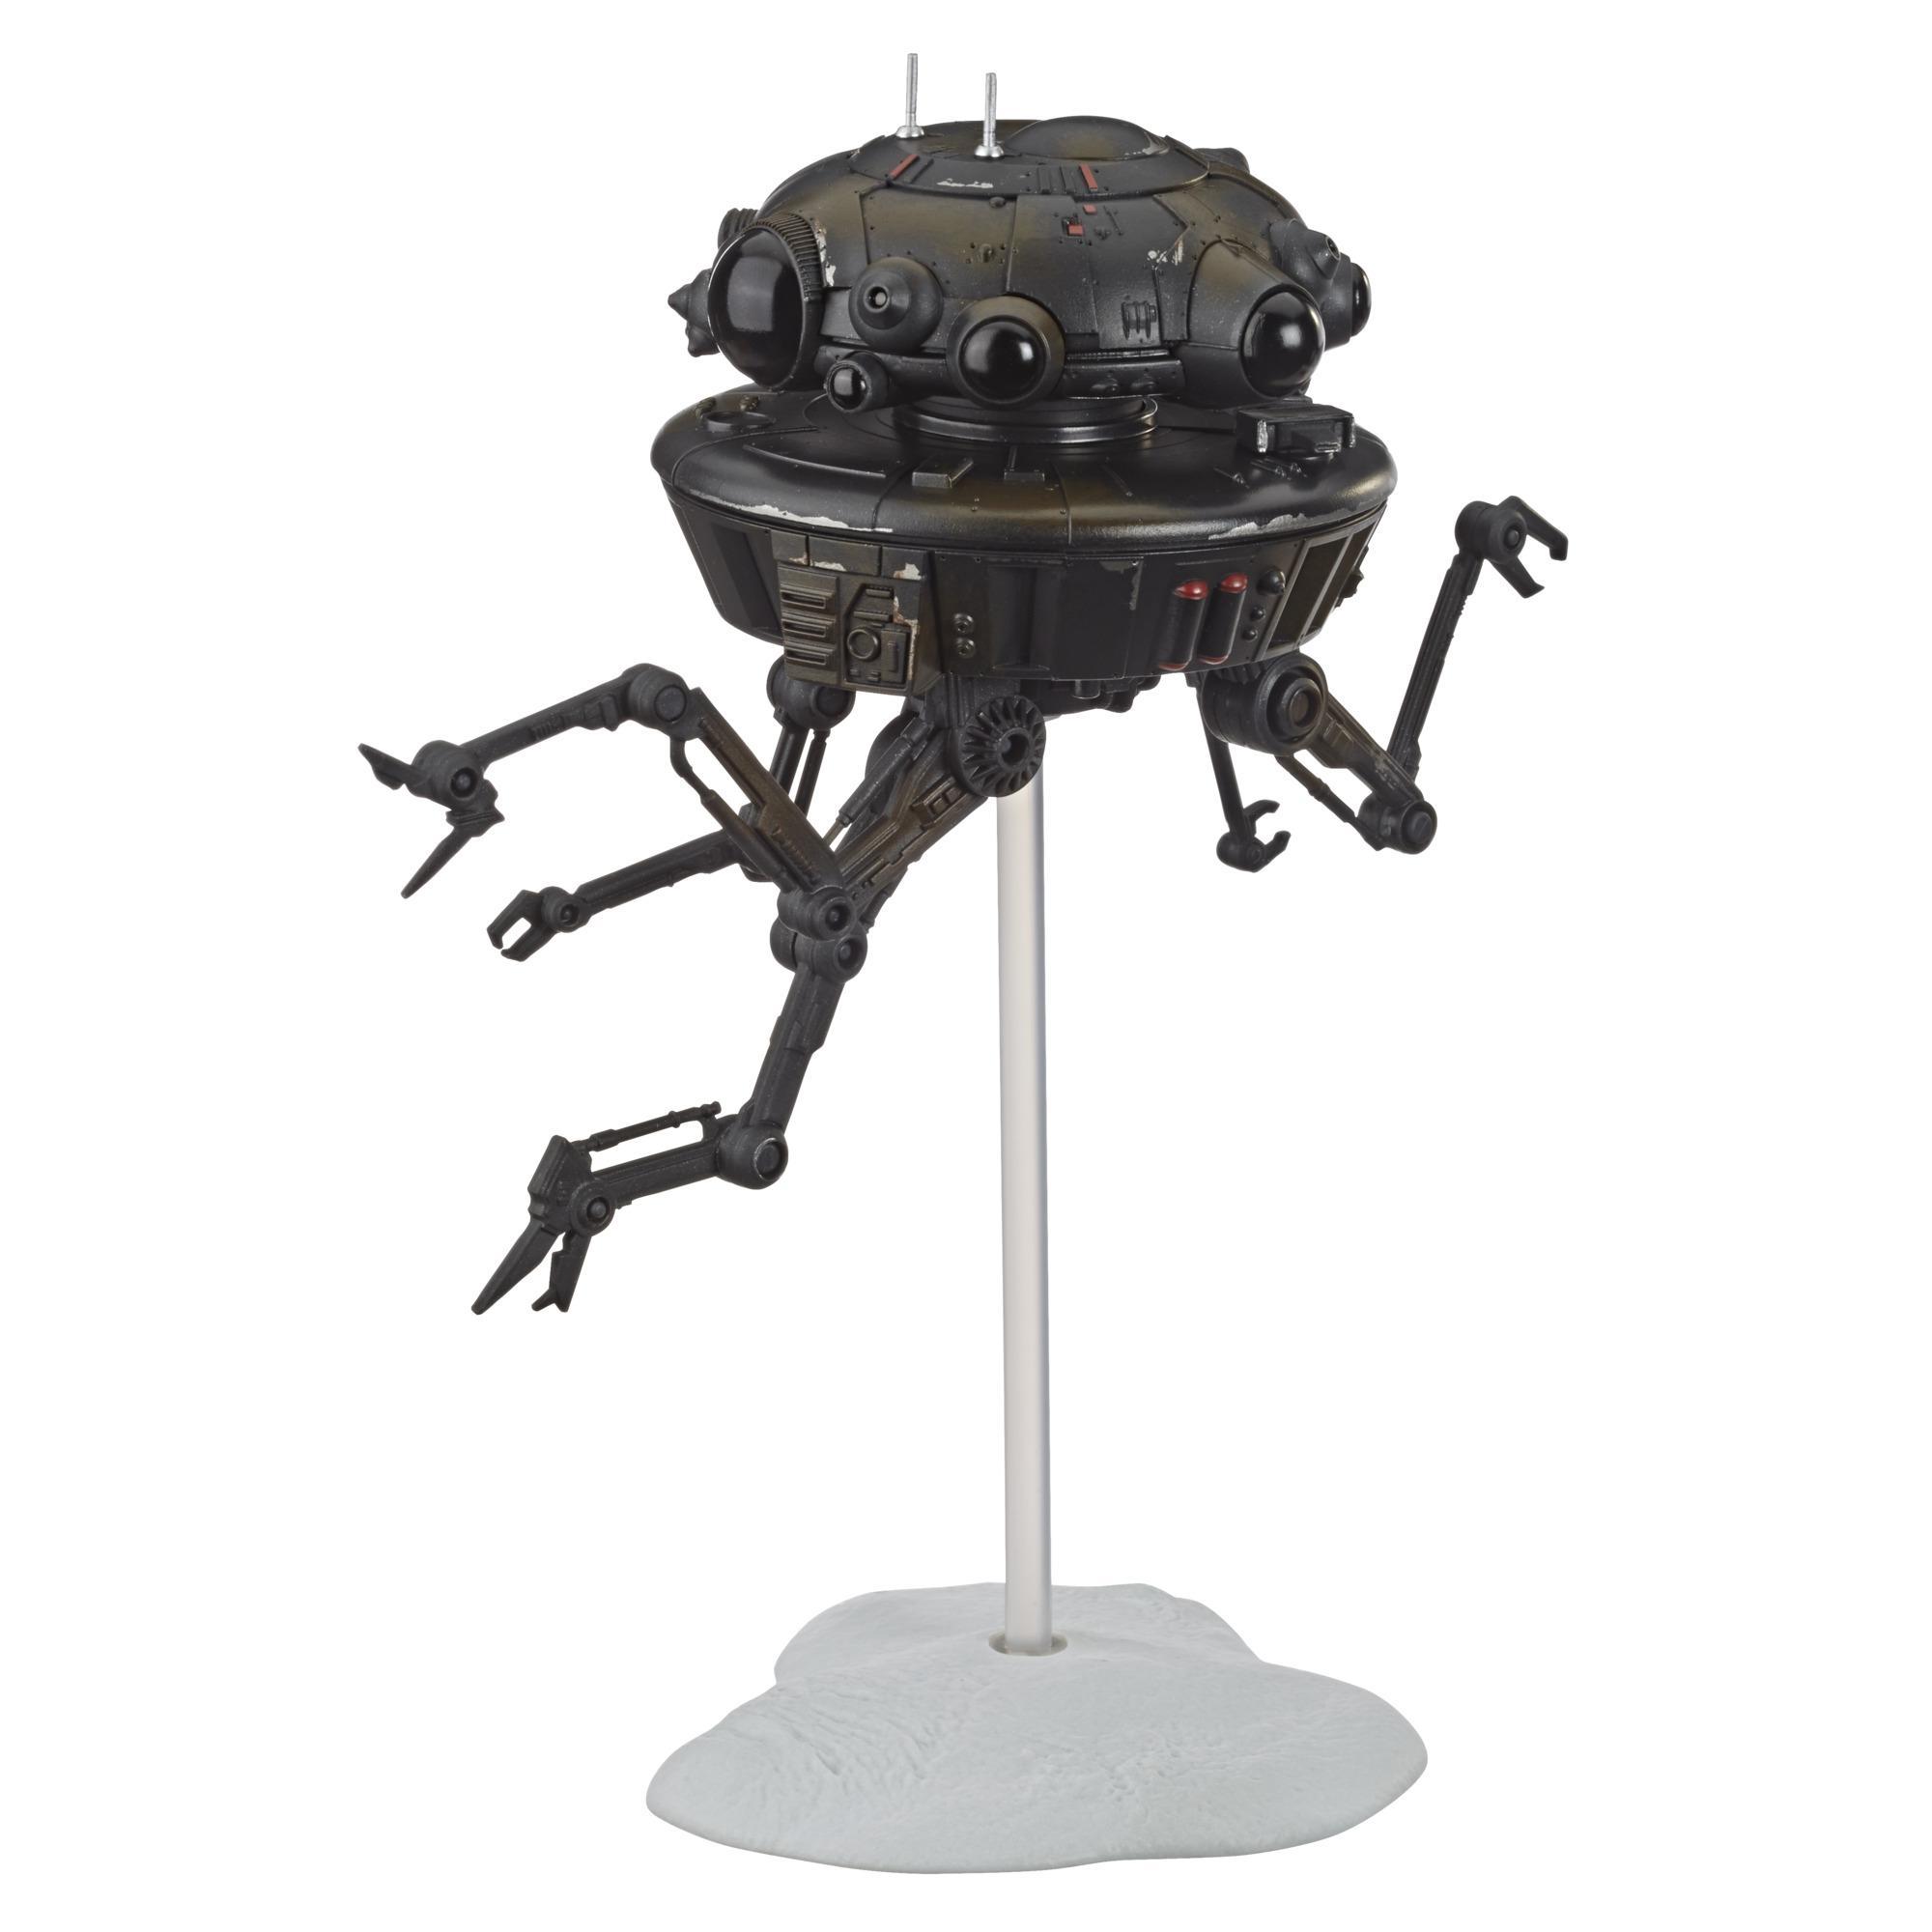 Star Wars The Black Series Suchdroide des Imperiums Deluxe Action-Figur